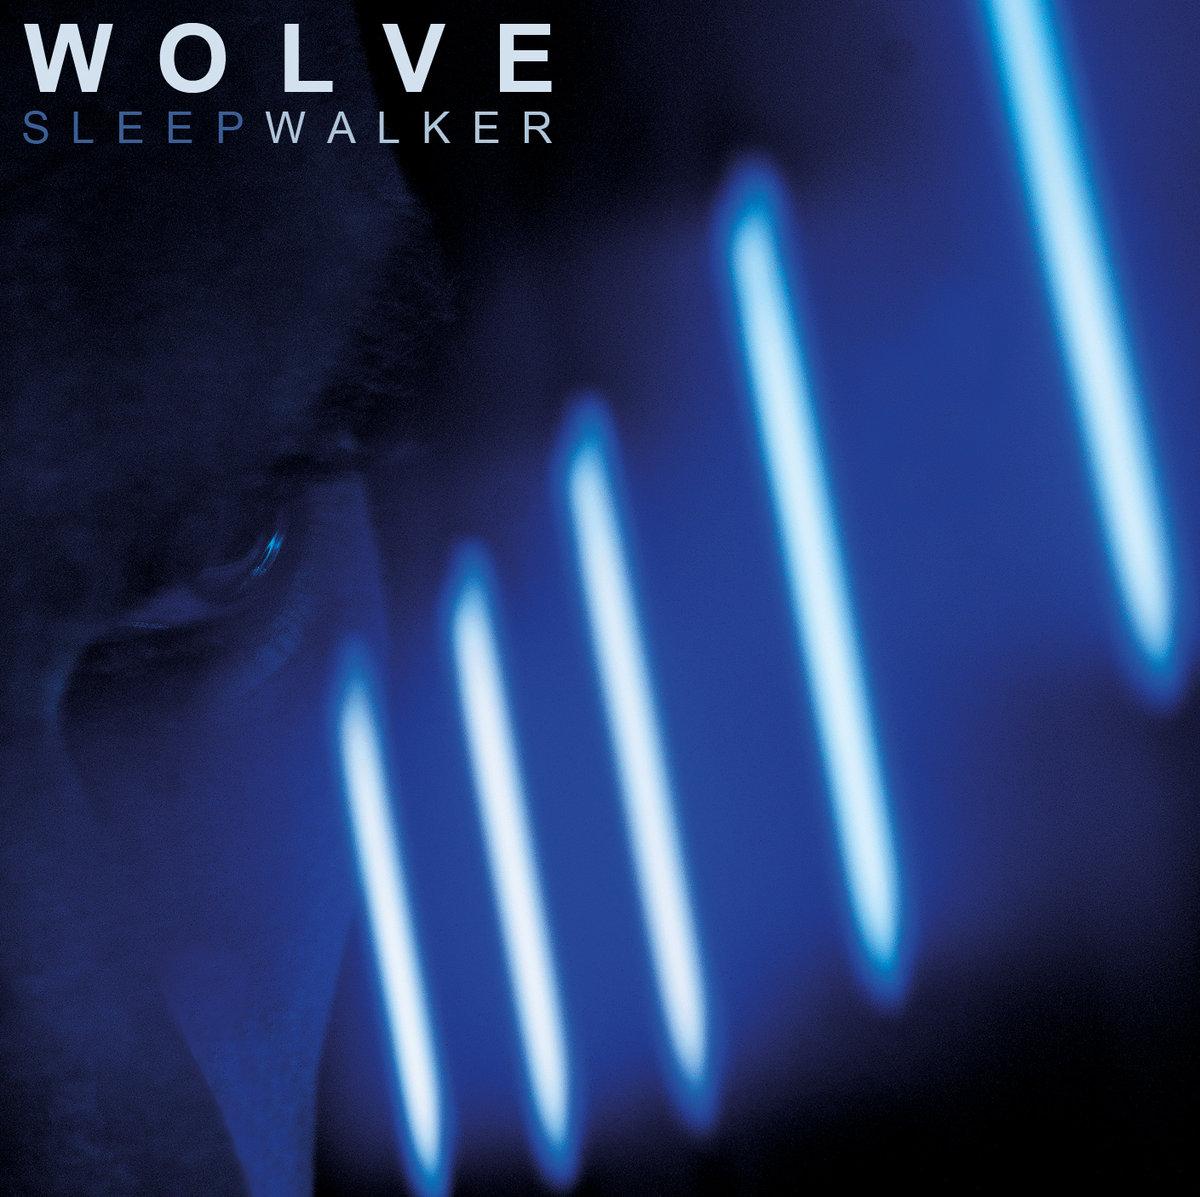 Wolve: Sleepwalker